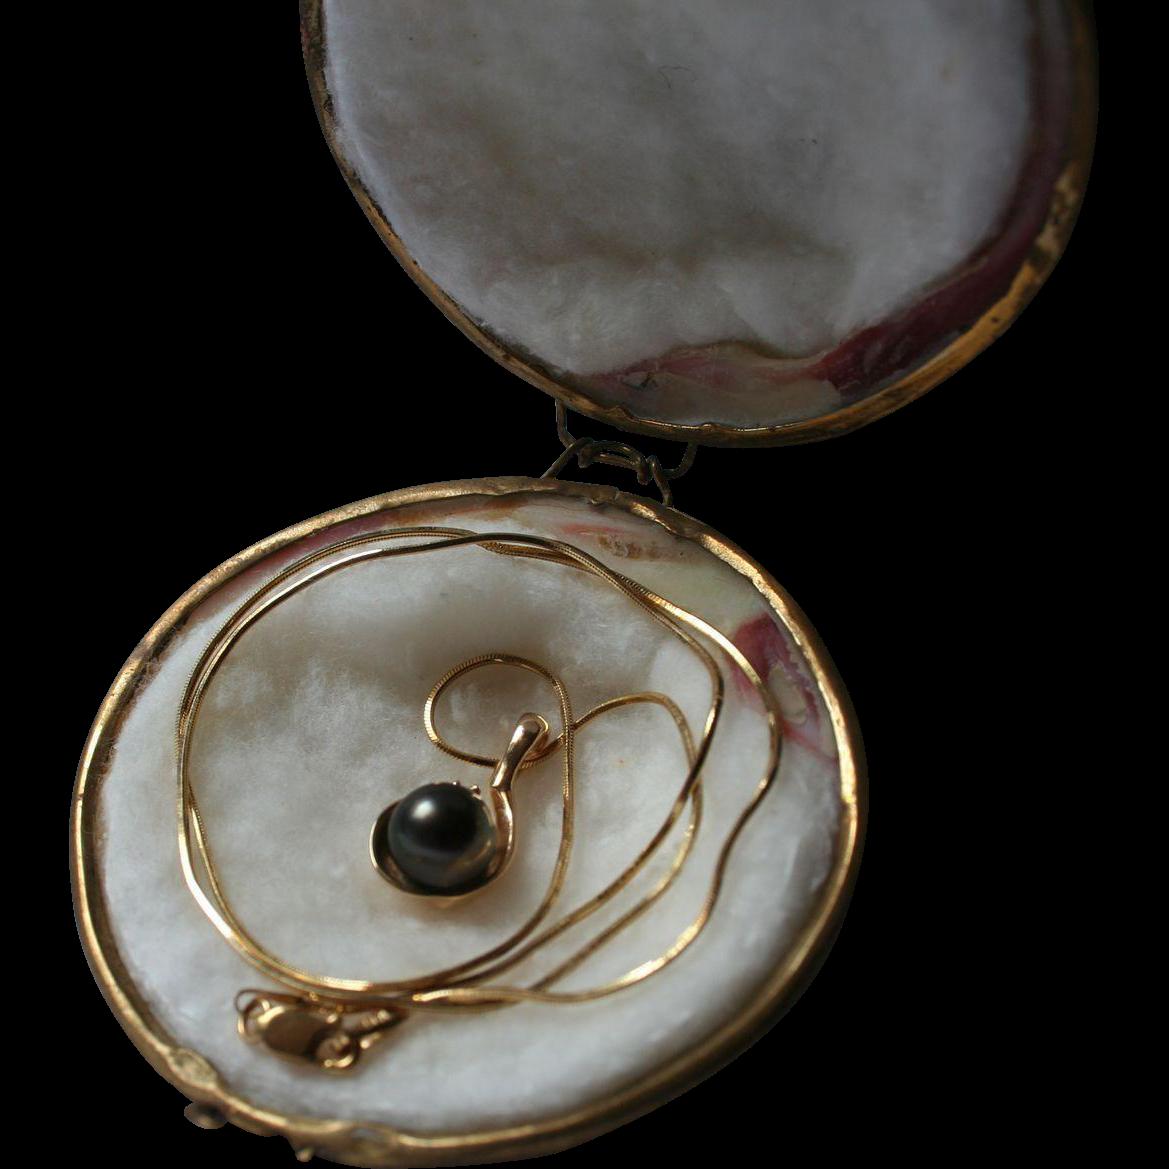 14k Gold Diamond Black Cultured Pearl Pendant Necklace In Original From Randomharvest On Ruby Lane